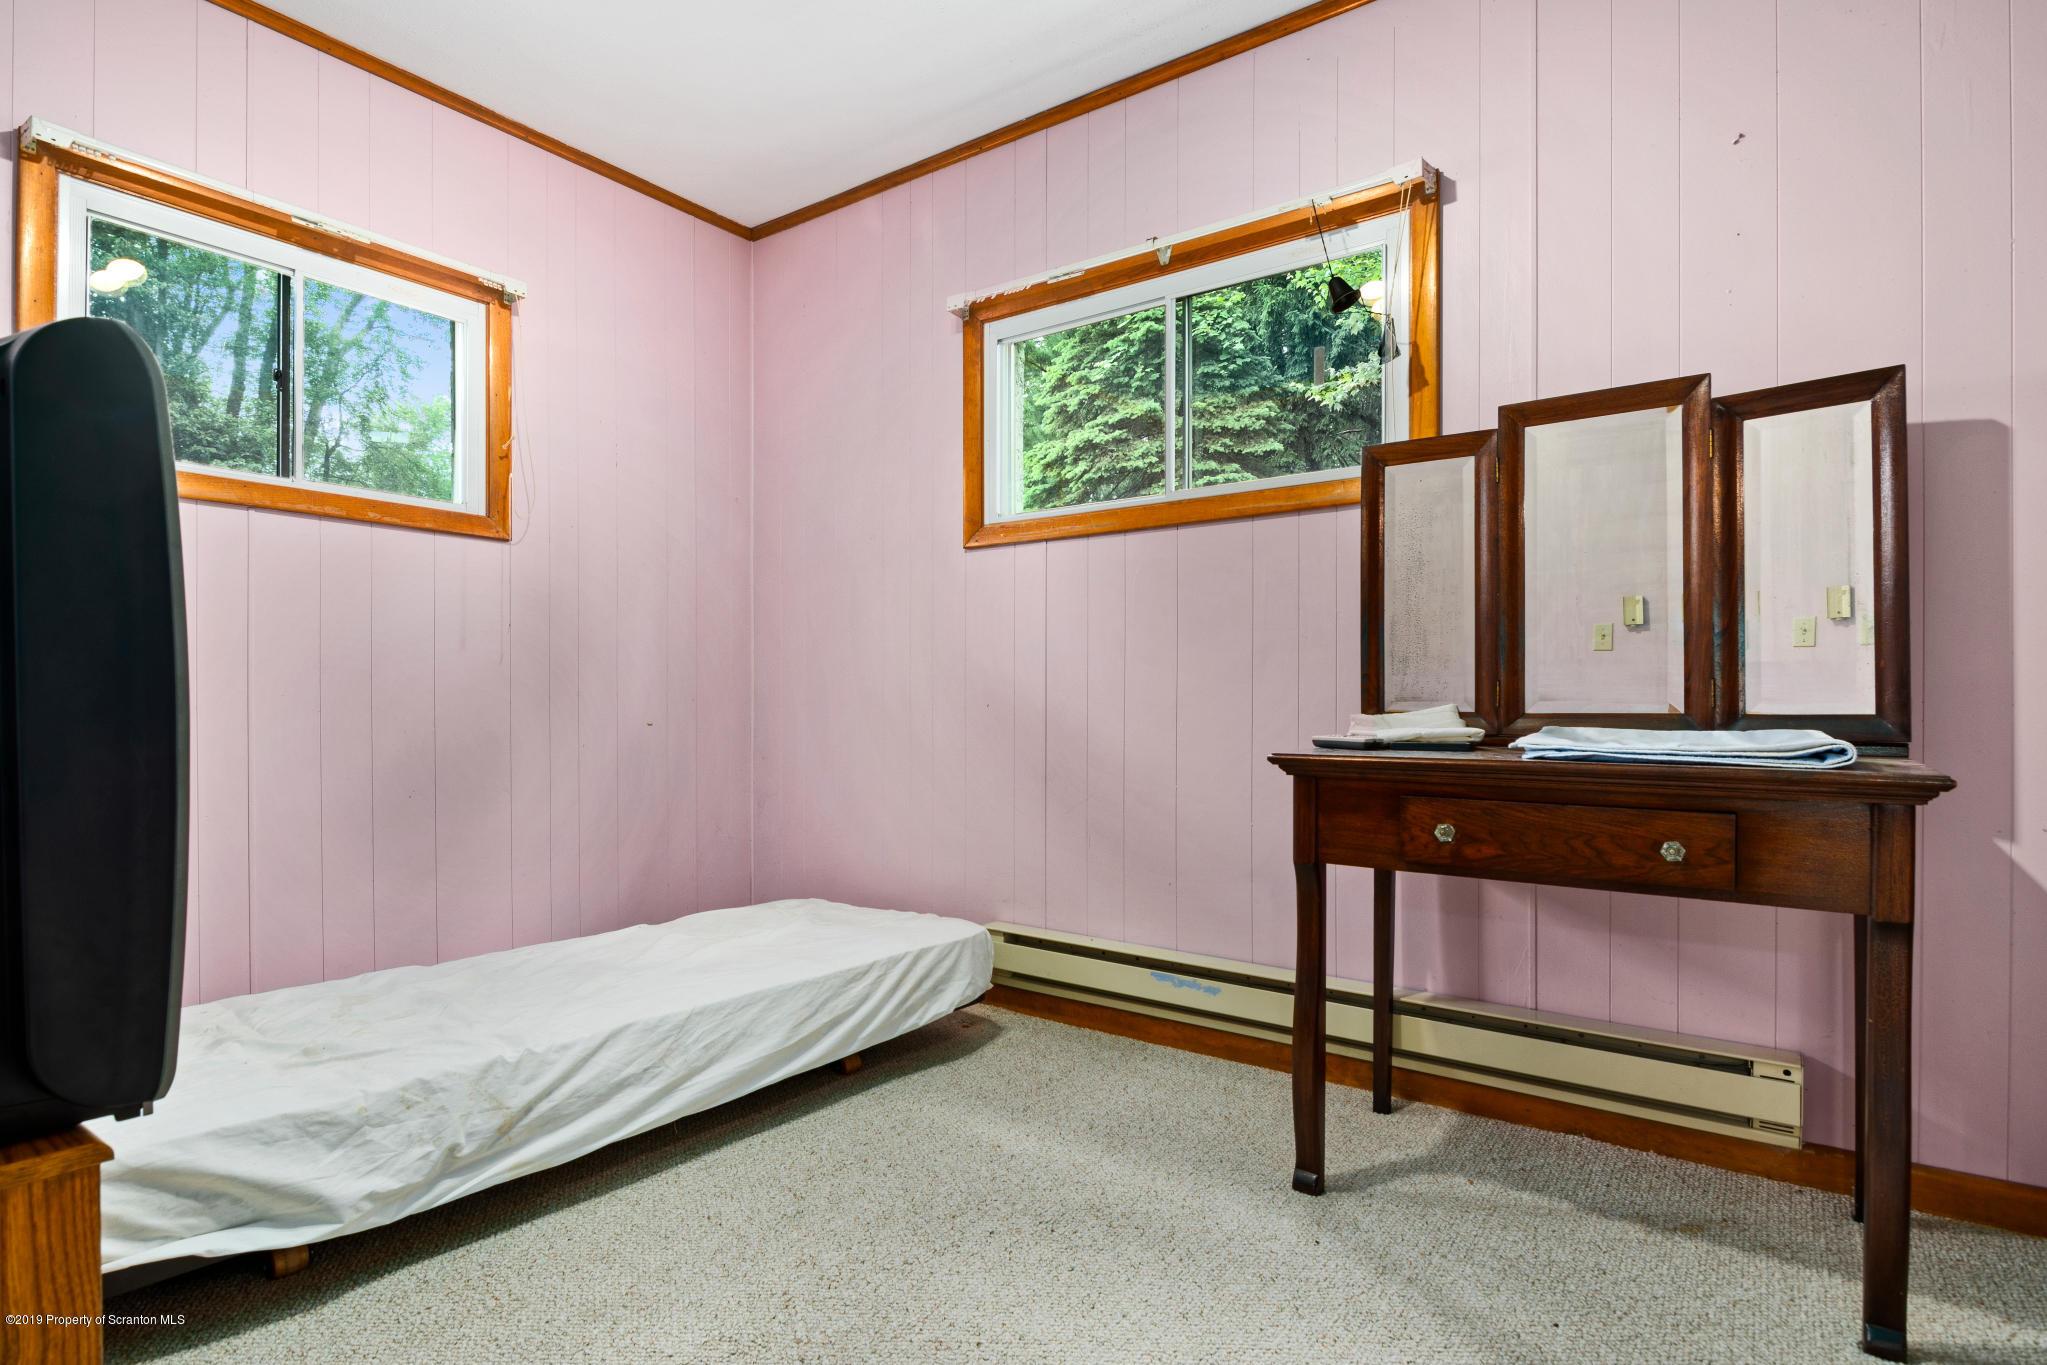 23-47 Kennedy Dr, Fleetville, Pennsylvania 18420, 3 Bedrooms Bedrooms, 6 Rooms Rooms,2 BathroomsBathrooms,Single Family,For Sale,Kennedy,20-1071